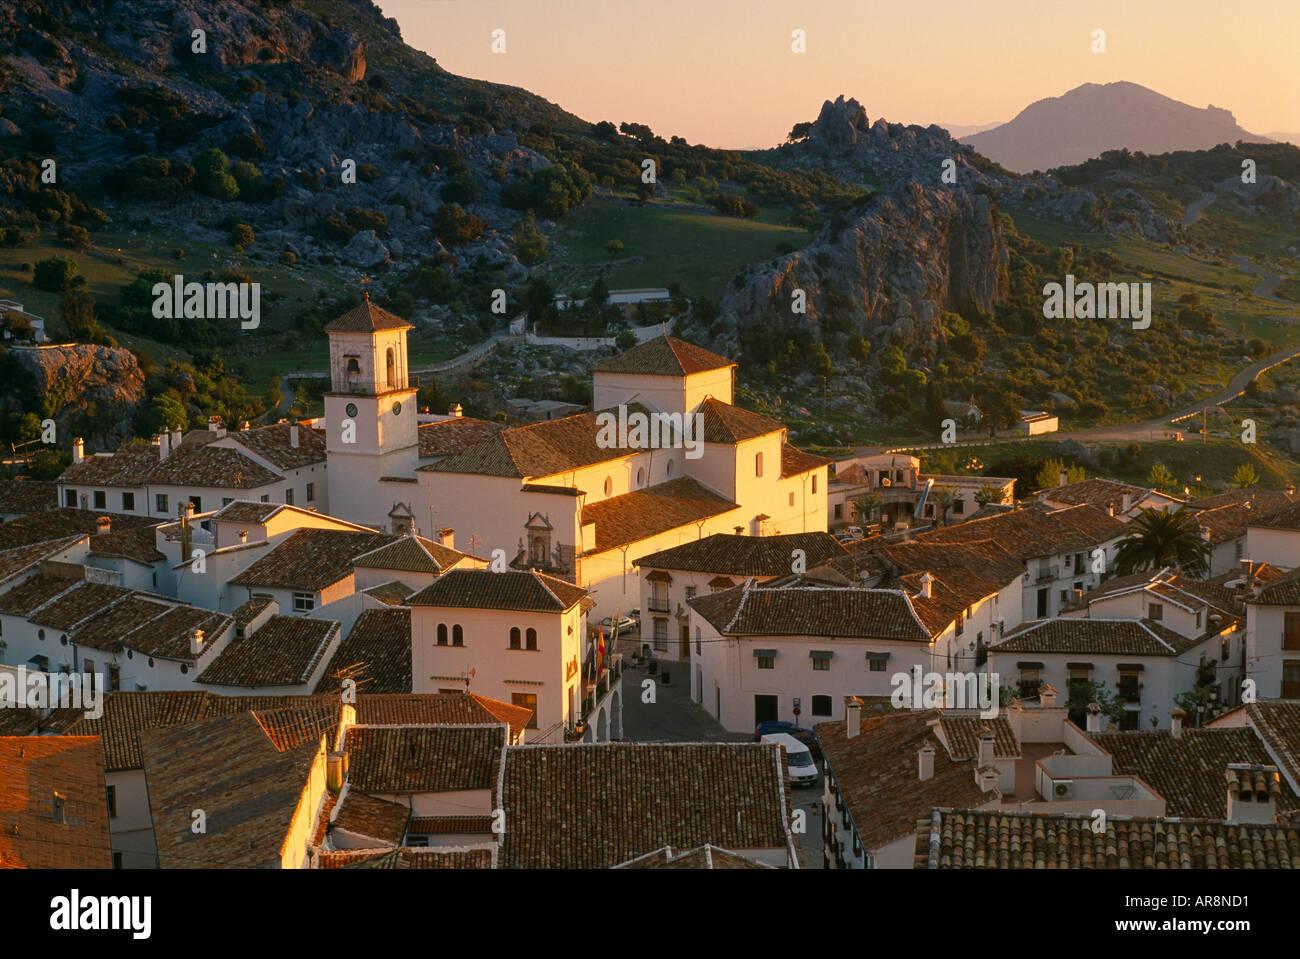 dawn at Grazalema a Pueblo Blanco nr Ronda Andalucia Spain - Stock Image